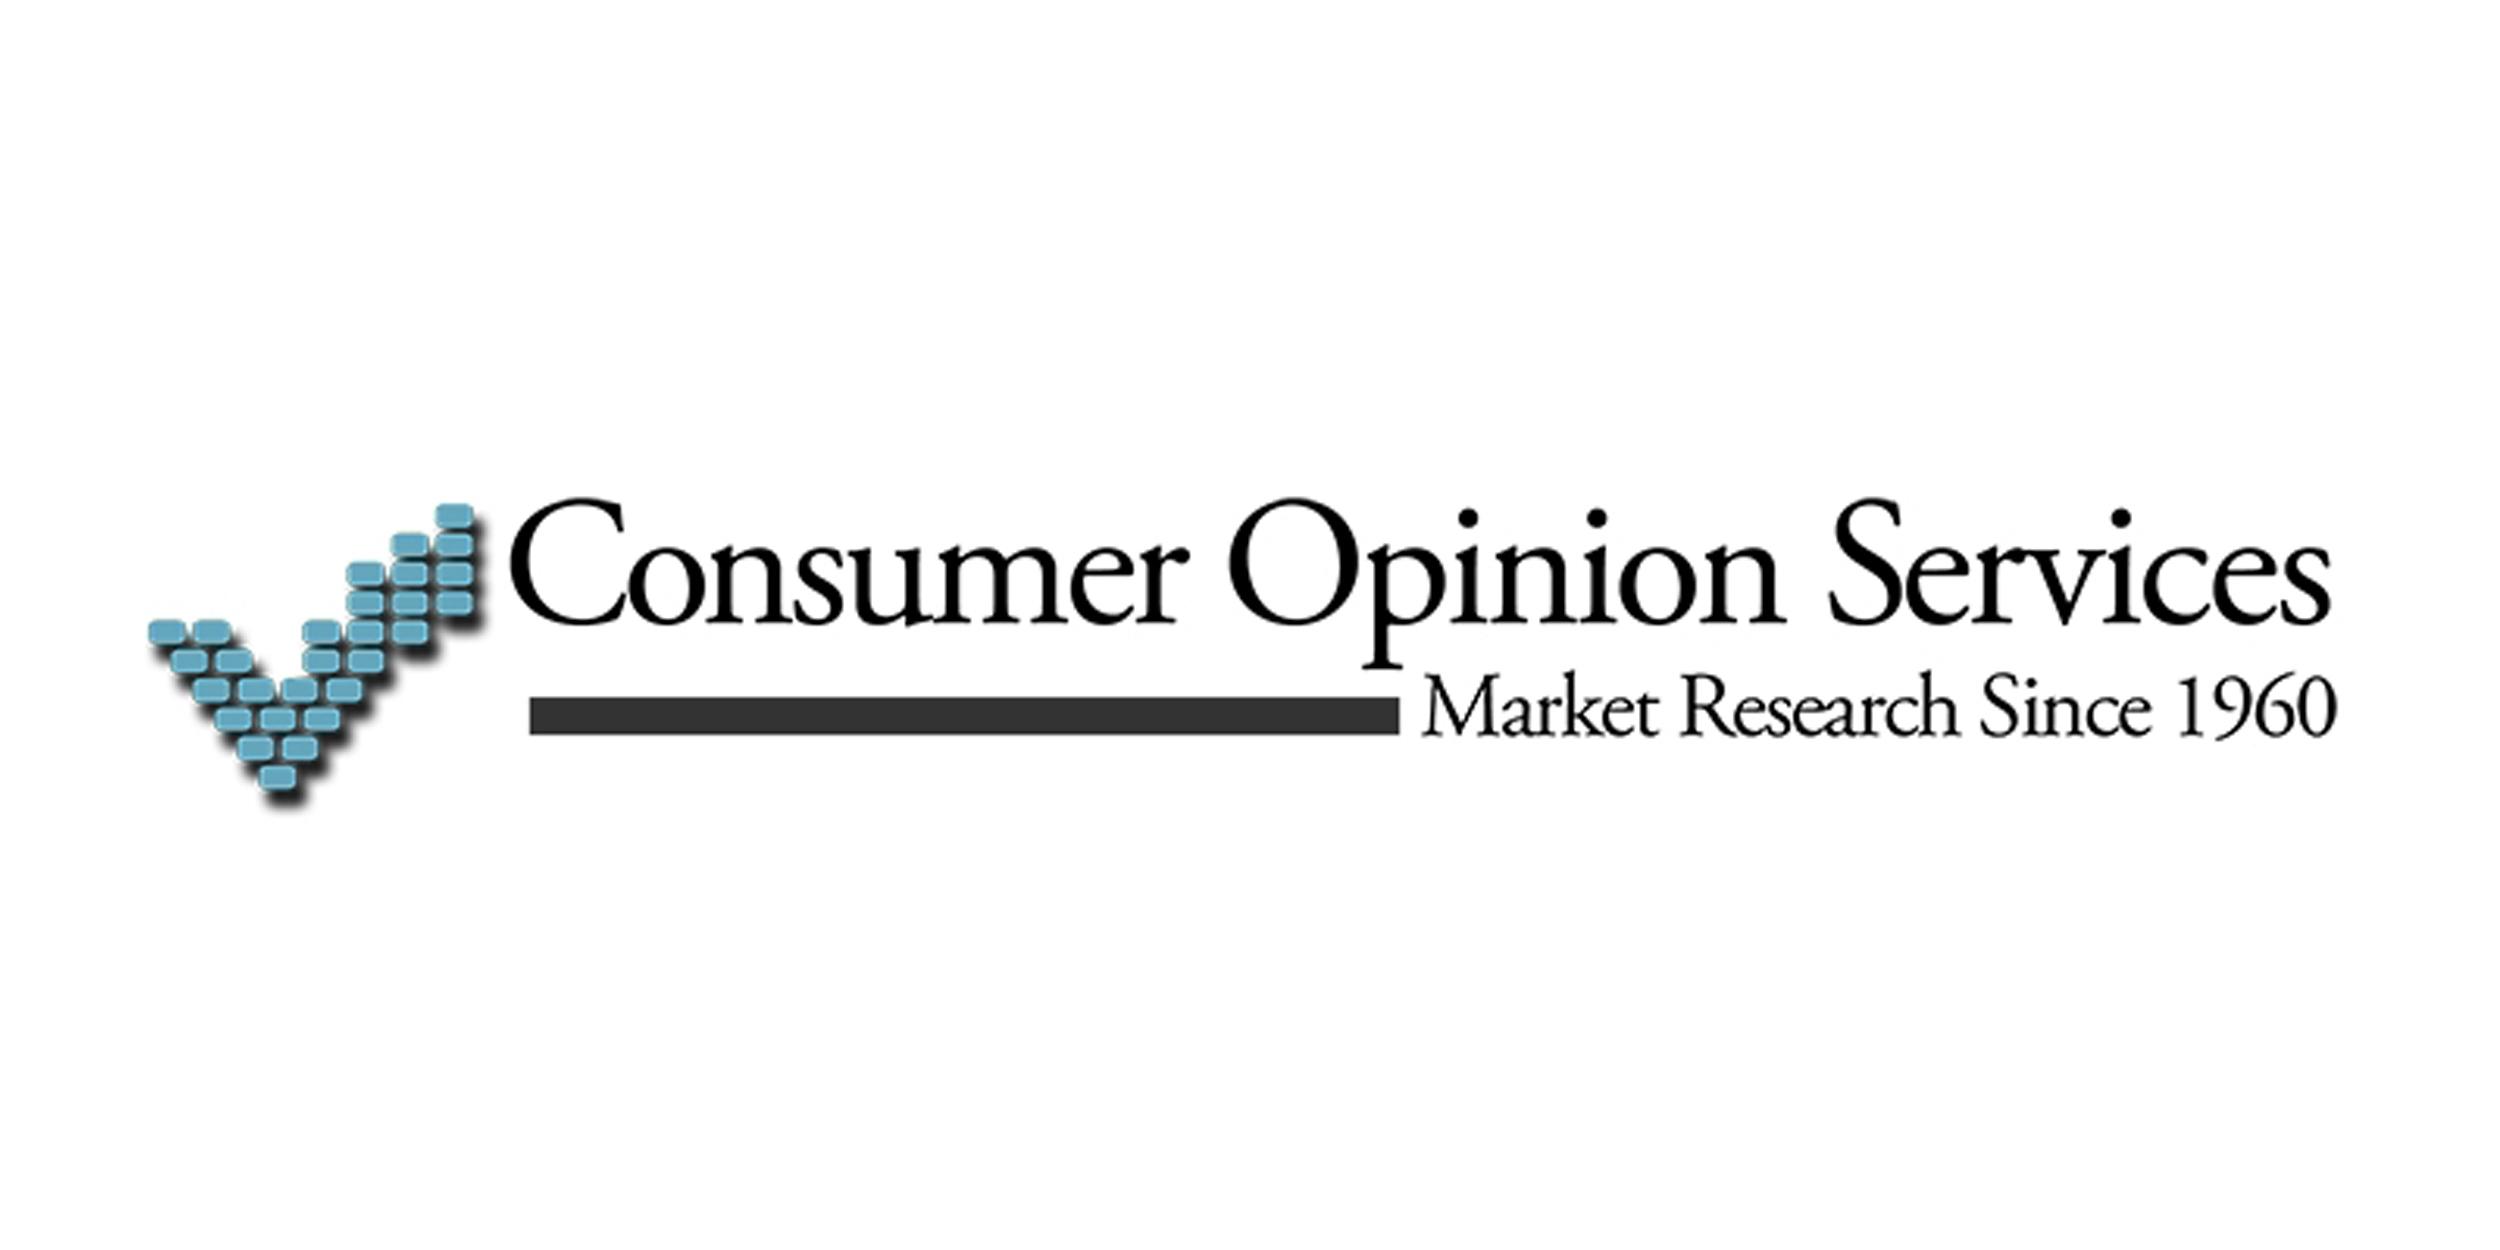 Consumer Opinino Services